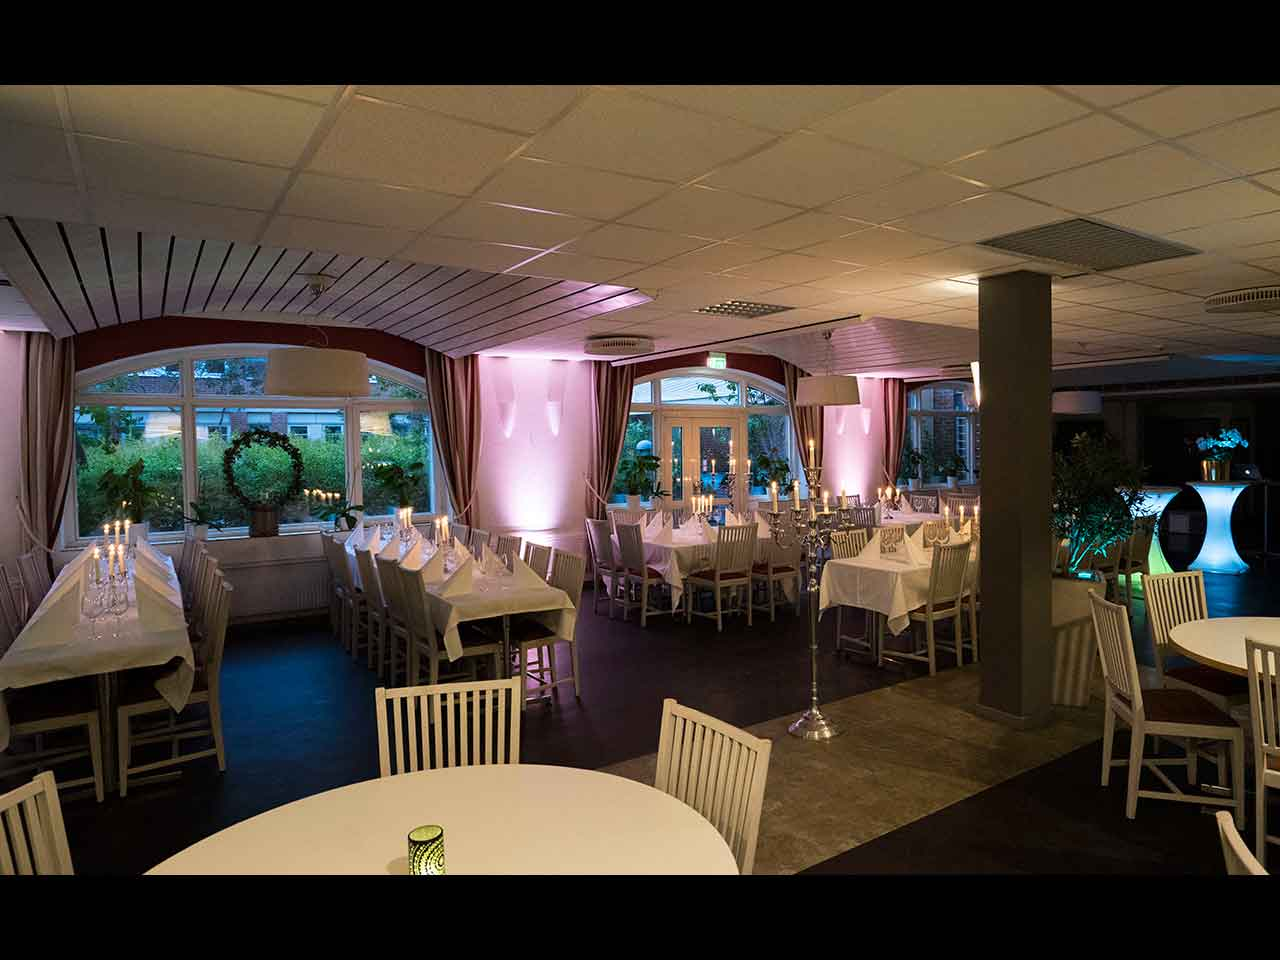 Bällstabro festvåning i Sundbyberg - Bröllopslokal